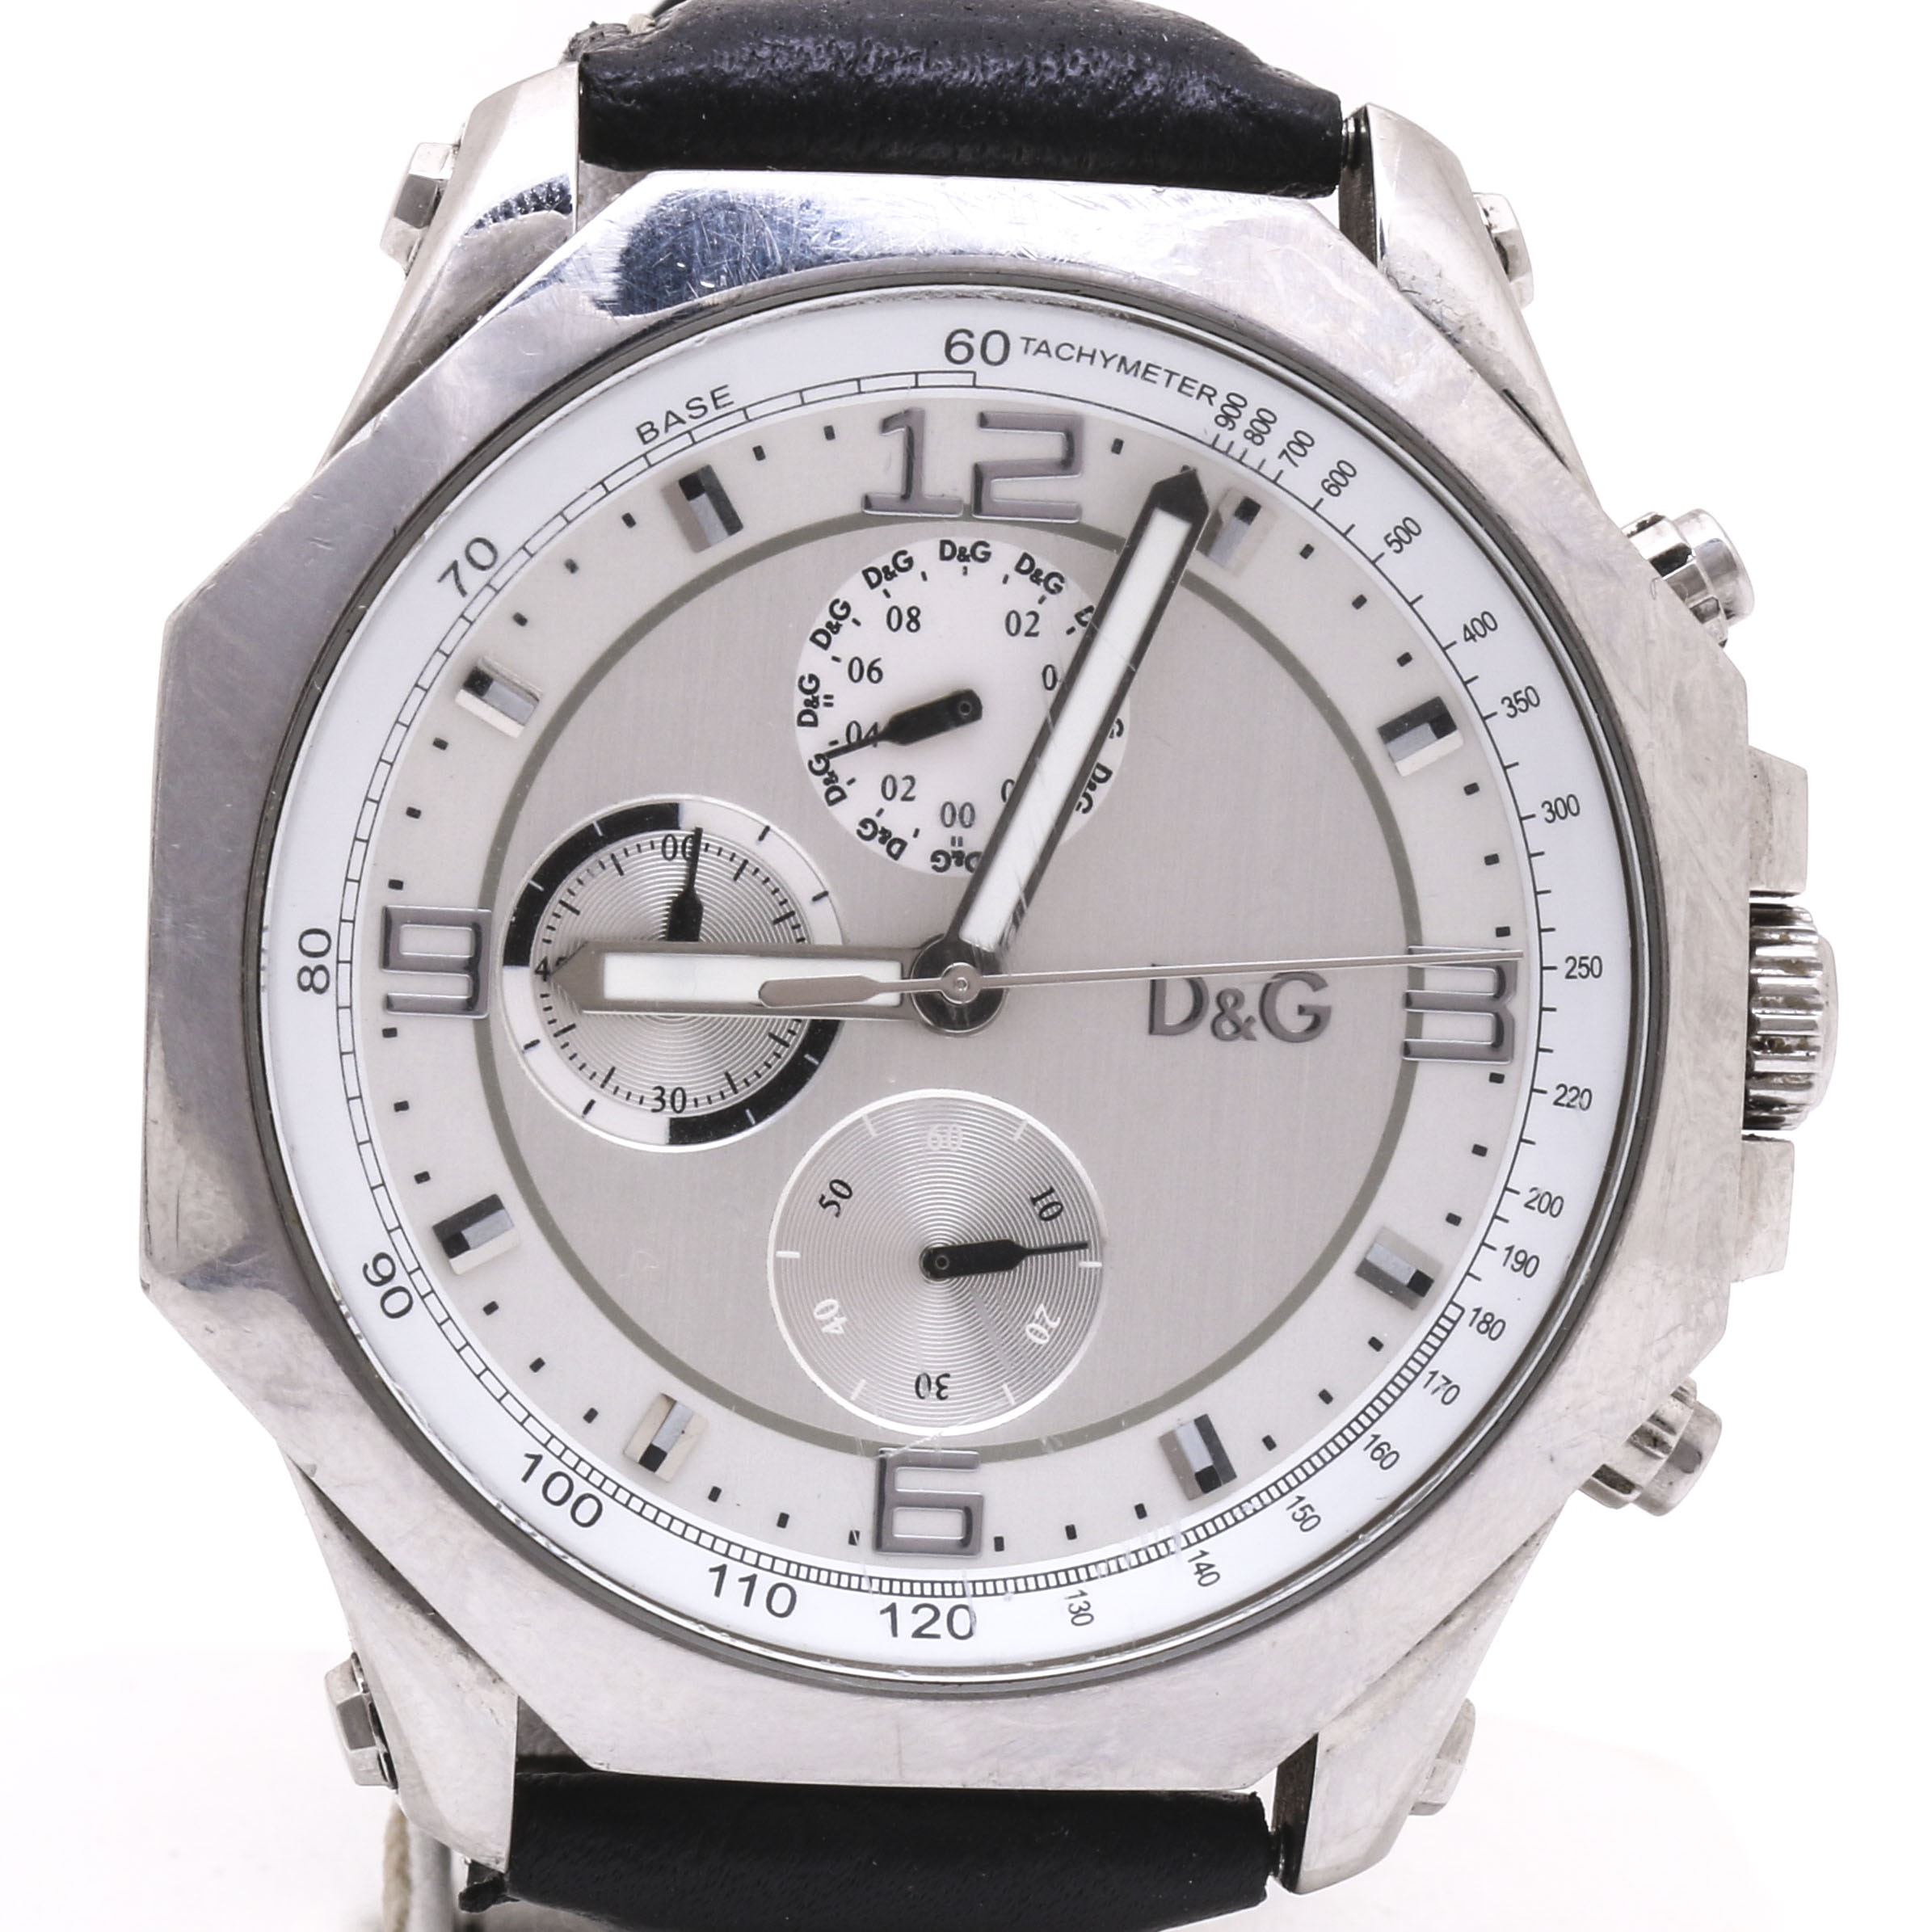 Dolce & Gabbana Stainless Steel Wristwatch